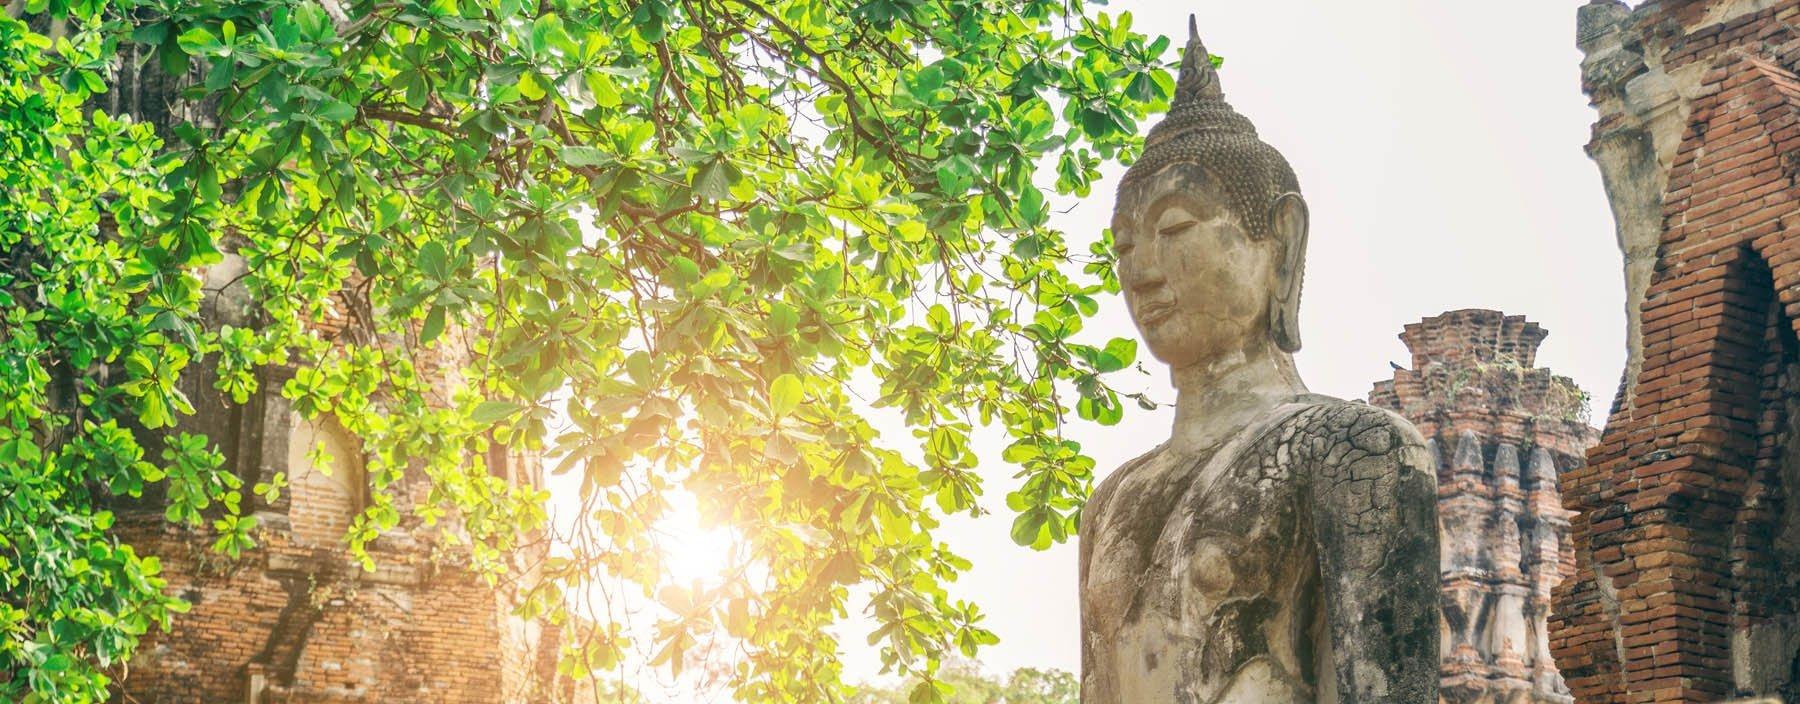 th, ayutthaya, wat chai wattanaram (5).jpg